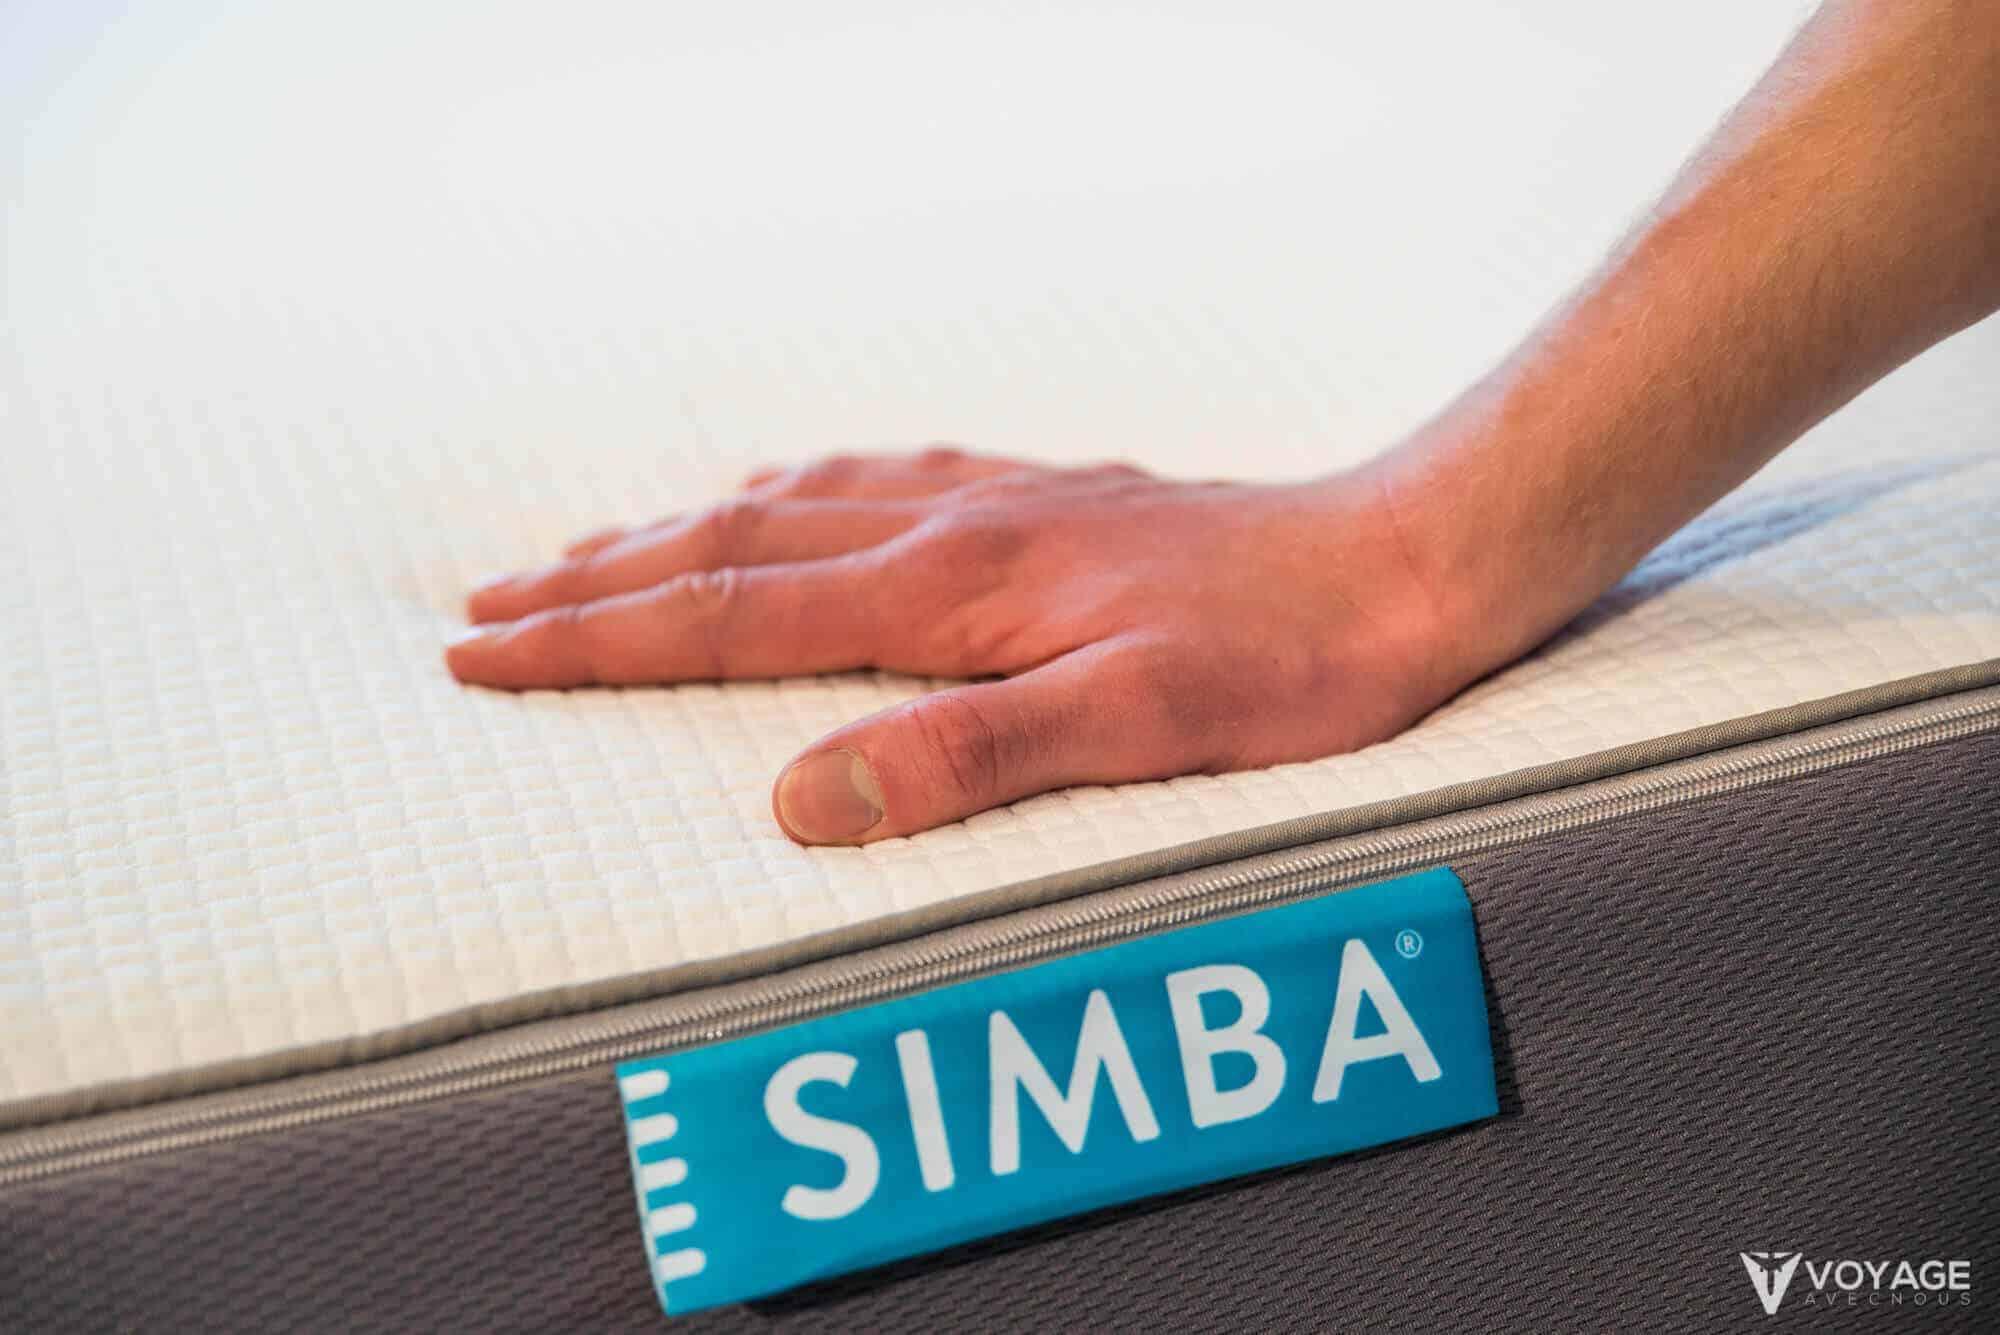 avis simba matelas notre test complet avis sur le matelas simba. Black Bedroom Furniture Sets. Home Design Ideas